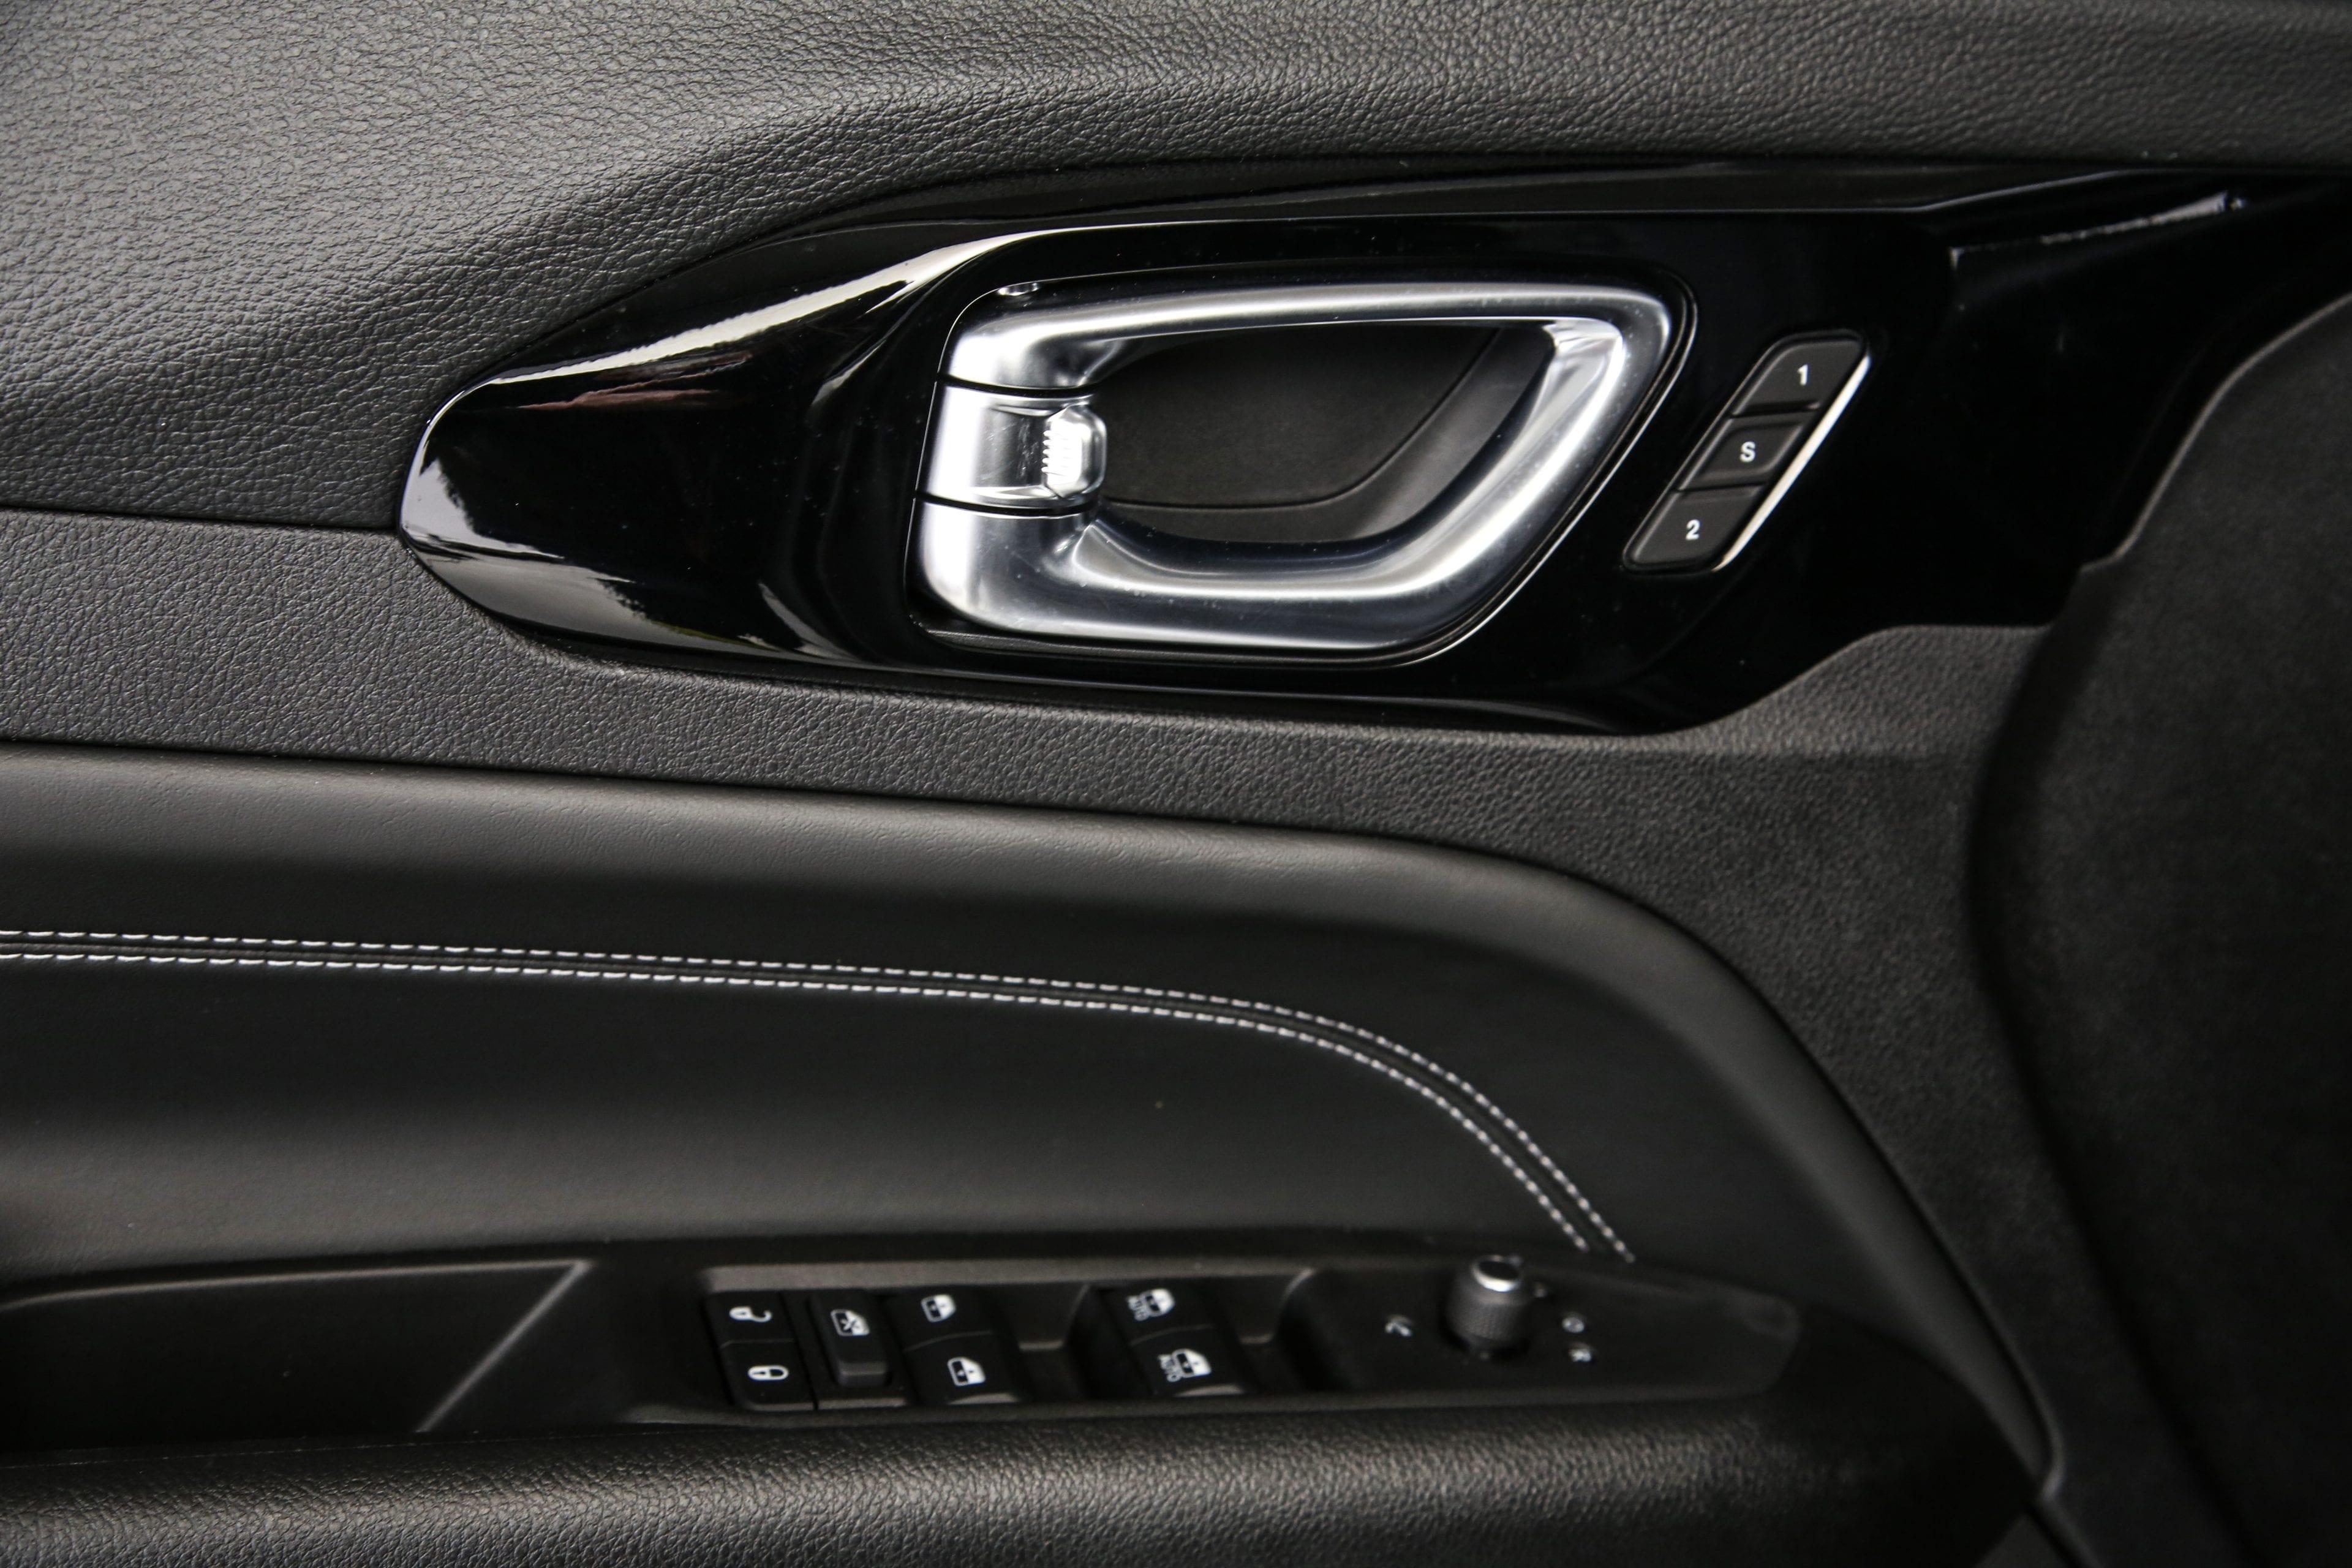 New Jeep Compass - detail binnenkant deur